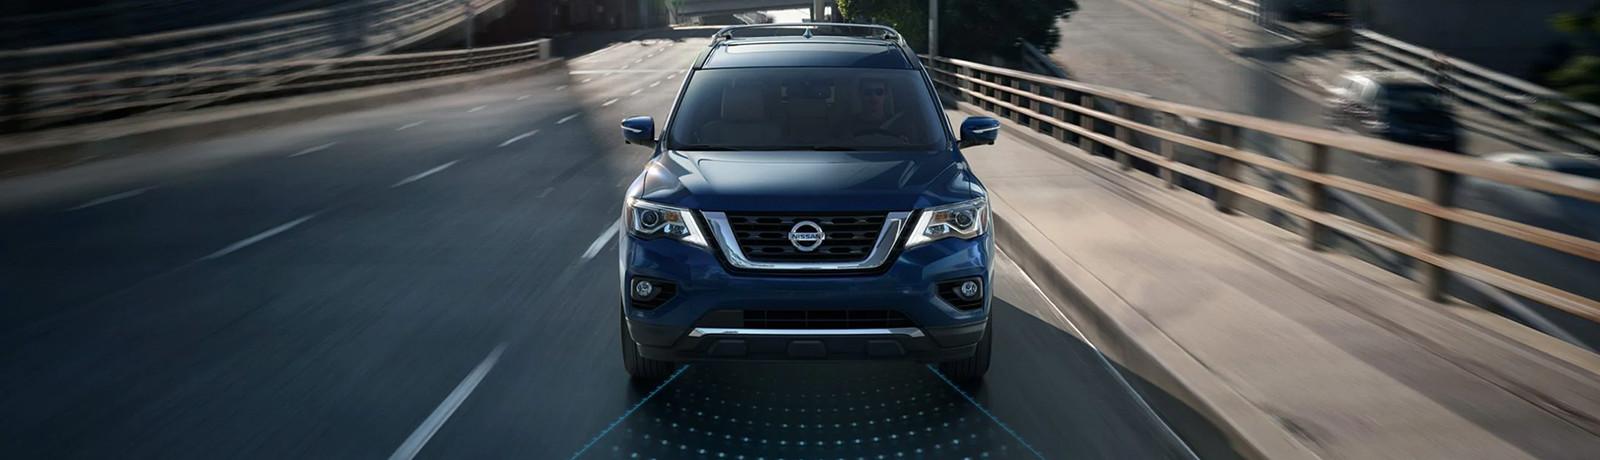 2019 Nissan Pathfinder | Preston Nissan, Nissan Dover DE Home